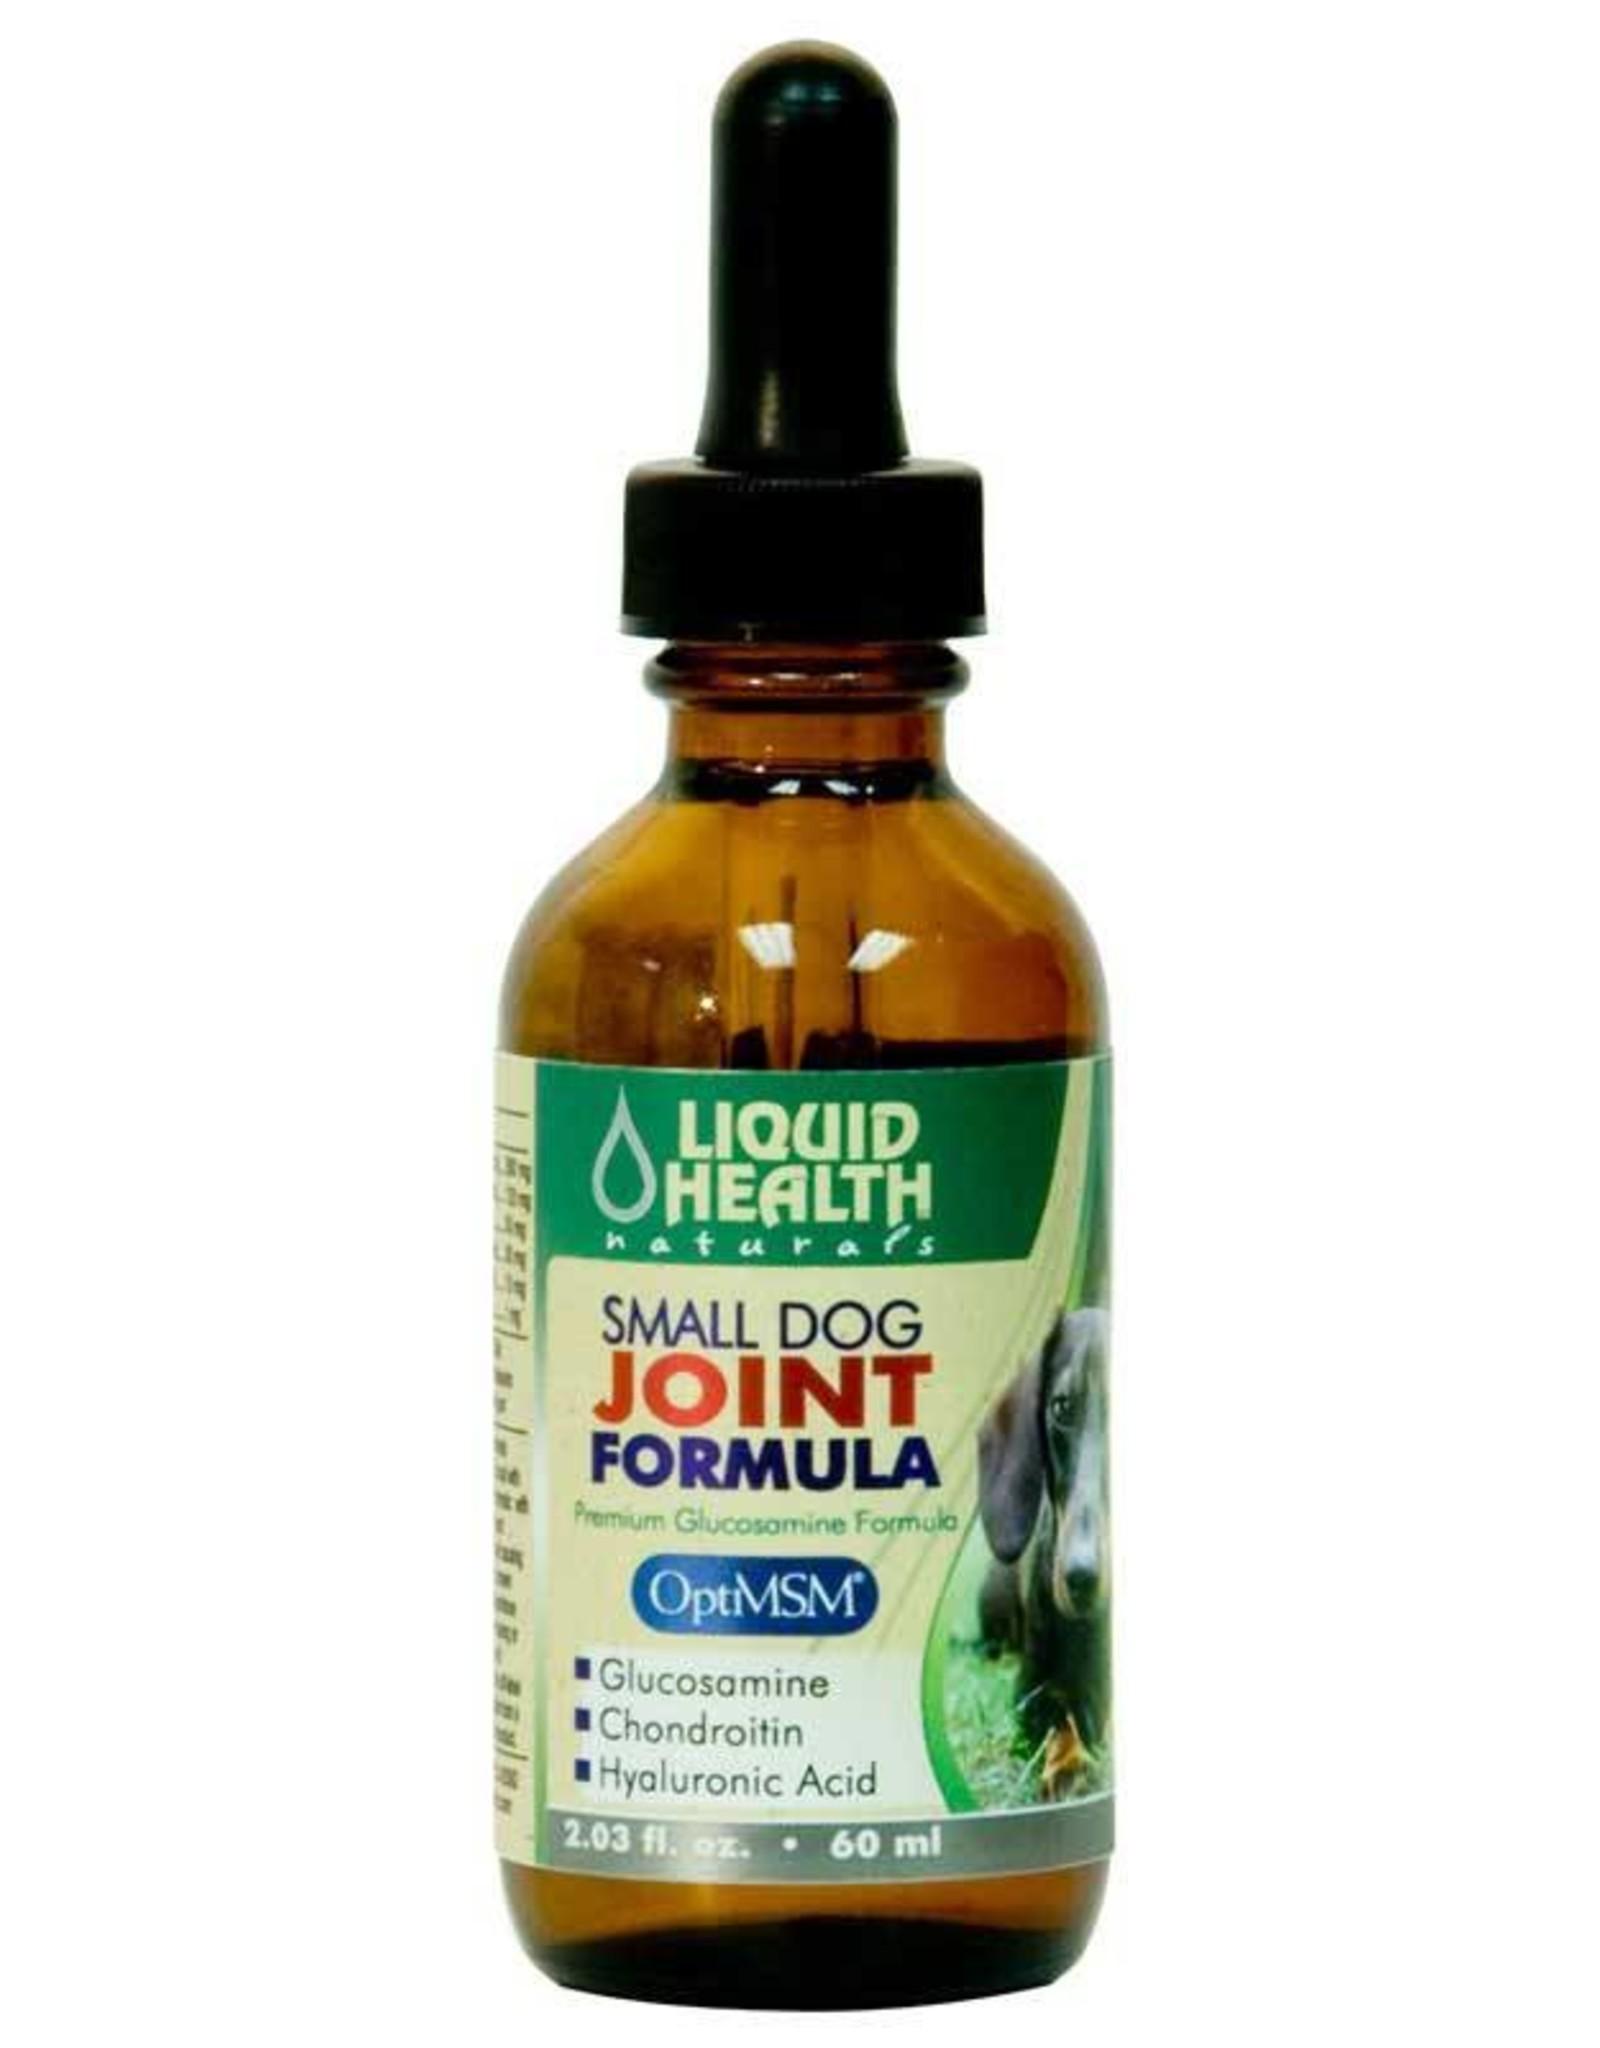 Liquid Health Liquid Health Small Dog Joint Formula 2oz